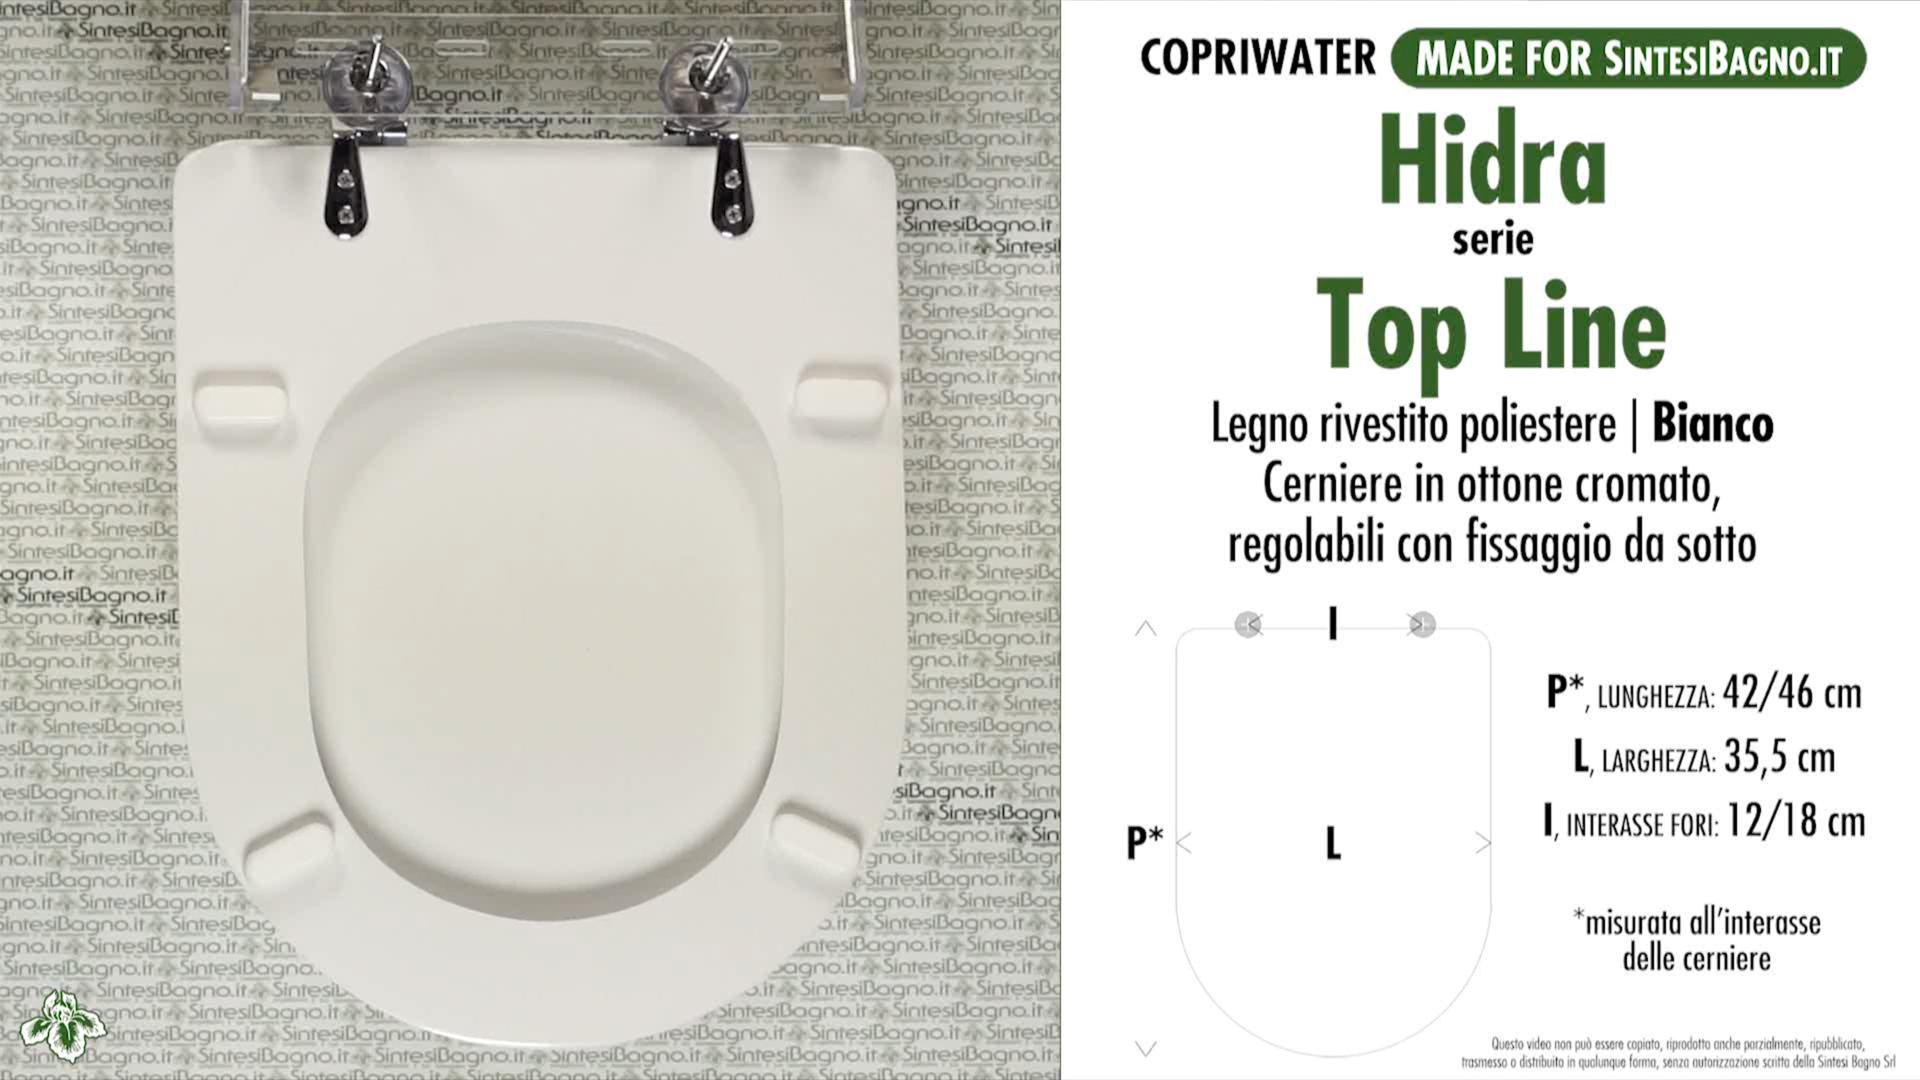 SCHEDA TECNICA MISURE copriwater HIDRA TOP LINE